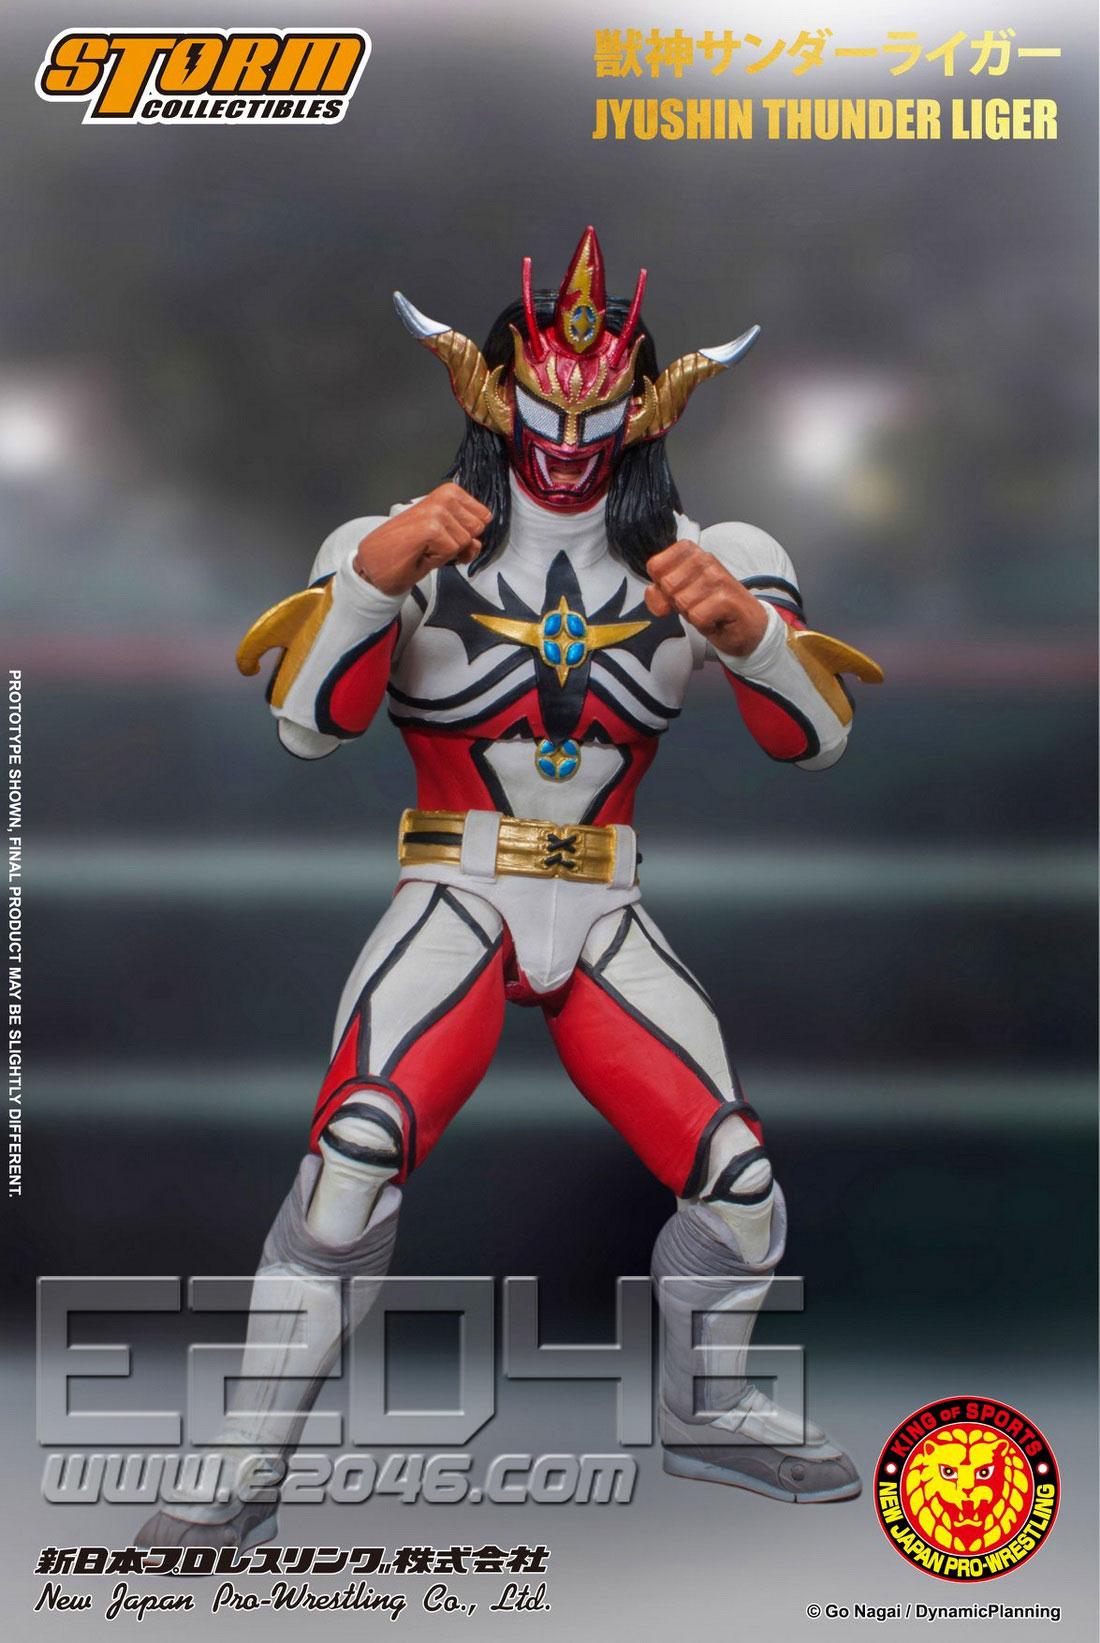 Jyushin Thunder Liger (DOLL)